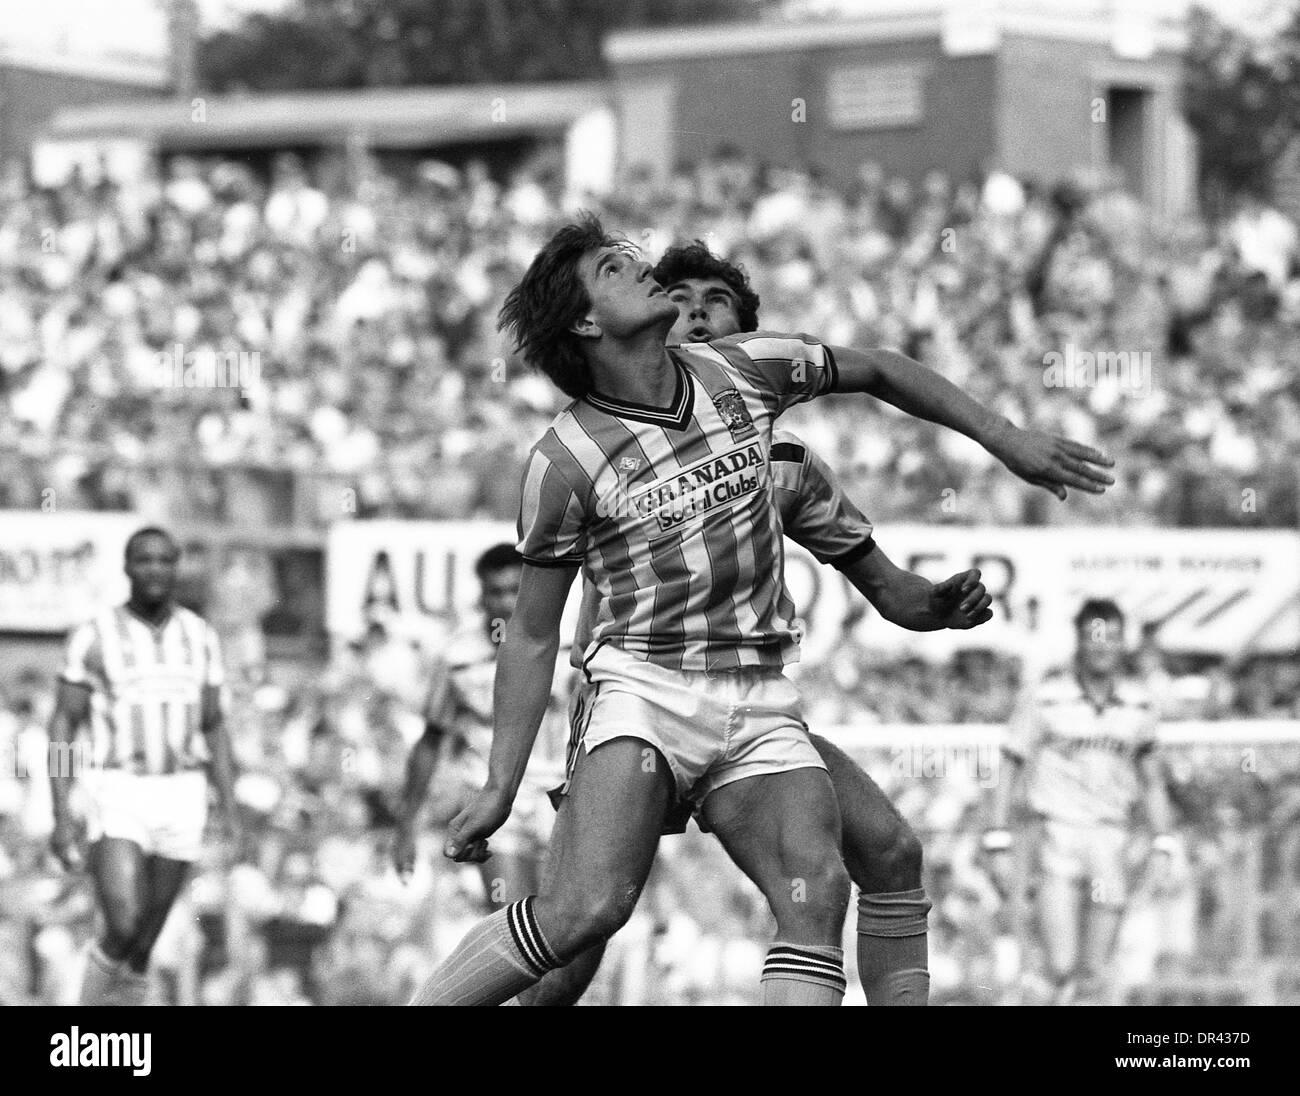 Coventry City V Aston Villa in der Highfield Road 10.04.86 Coventry City Fußballer David Phillips 1986 1980s Stockbild